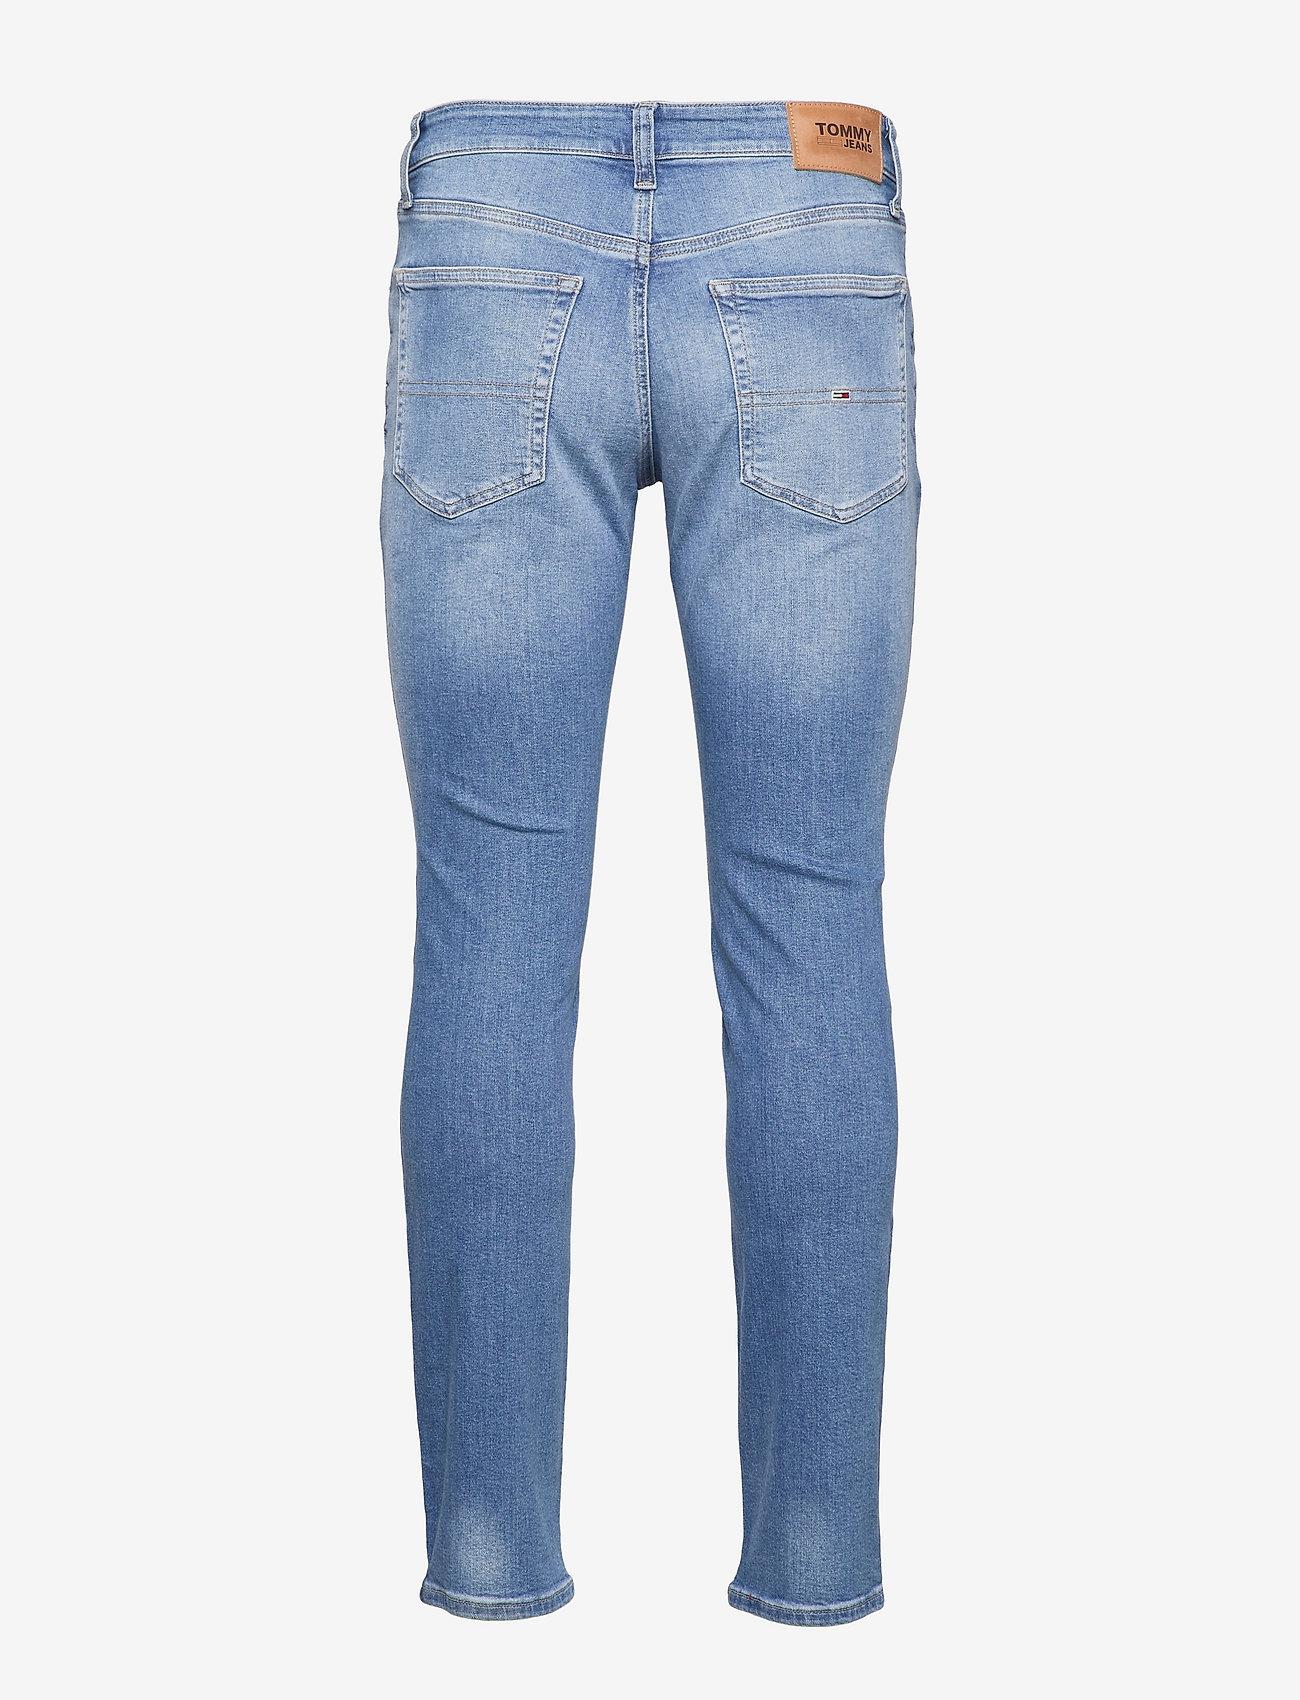 Tommy Jeans - SCANTON SLIM AE118 LBS - slim jeans - denim light - 1